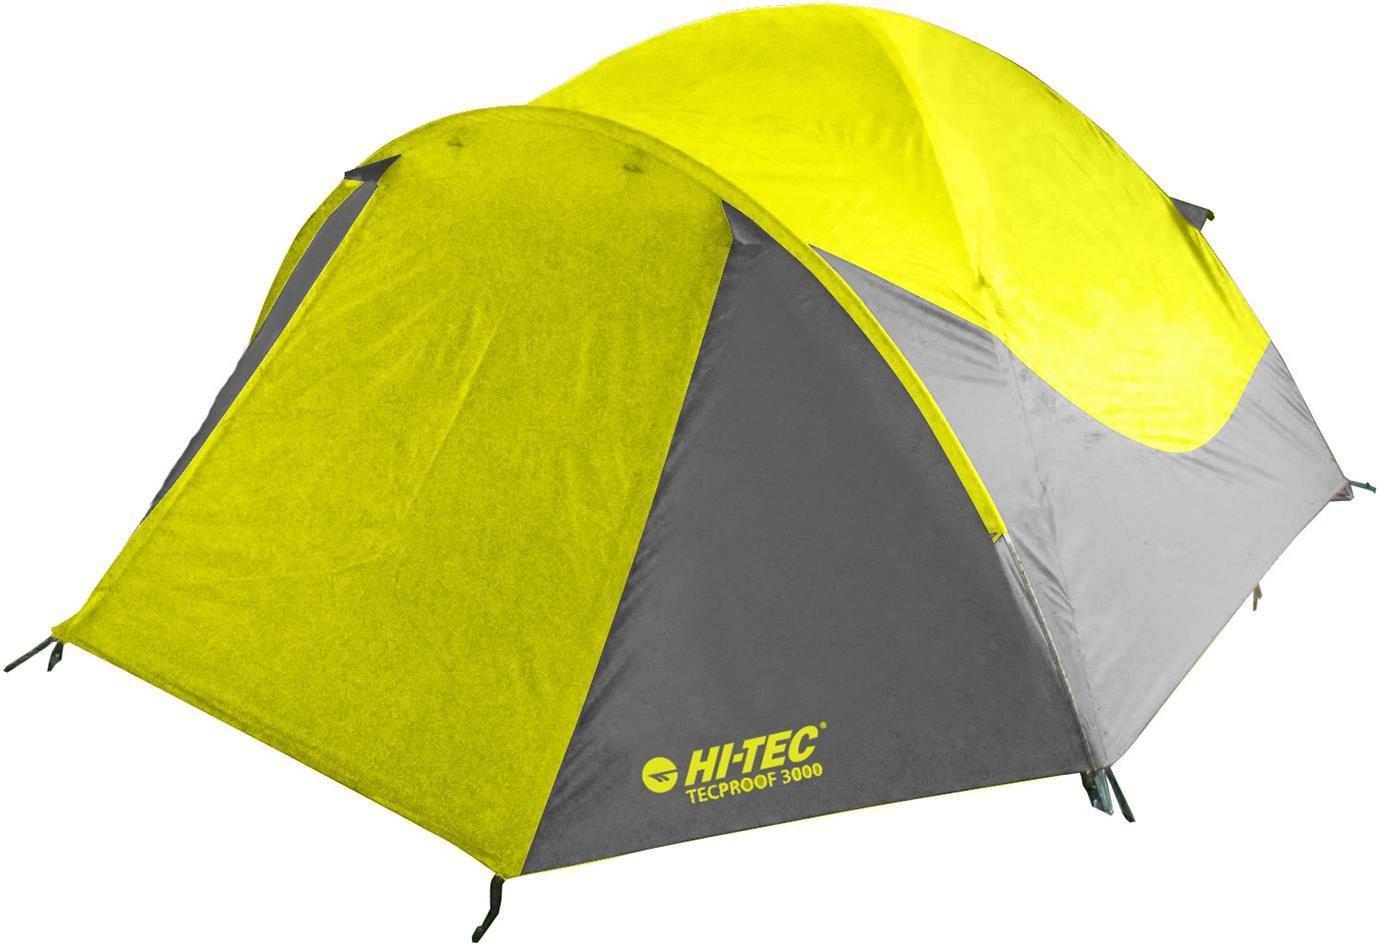 HI-TEC Namiot turystyczny TOBAGO 3 osobowy 3000mm